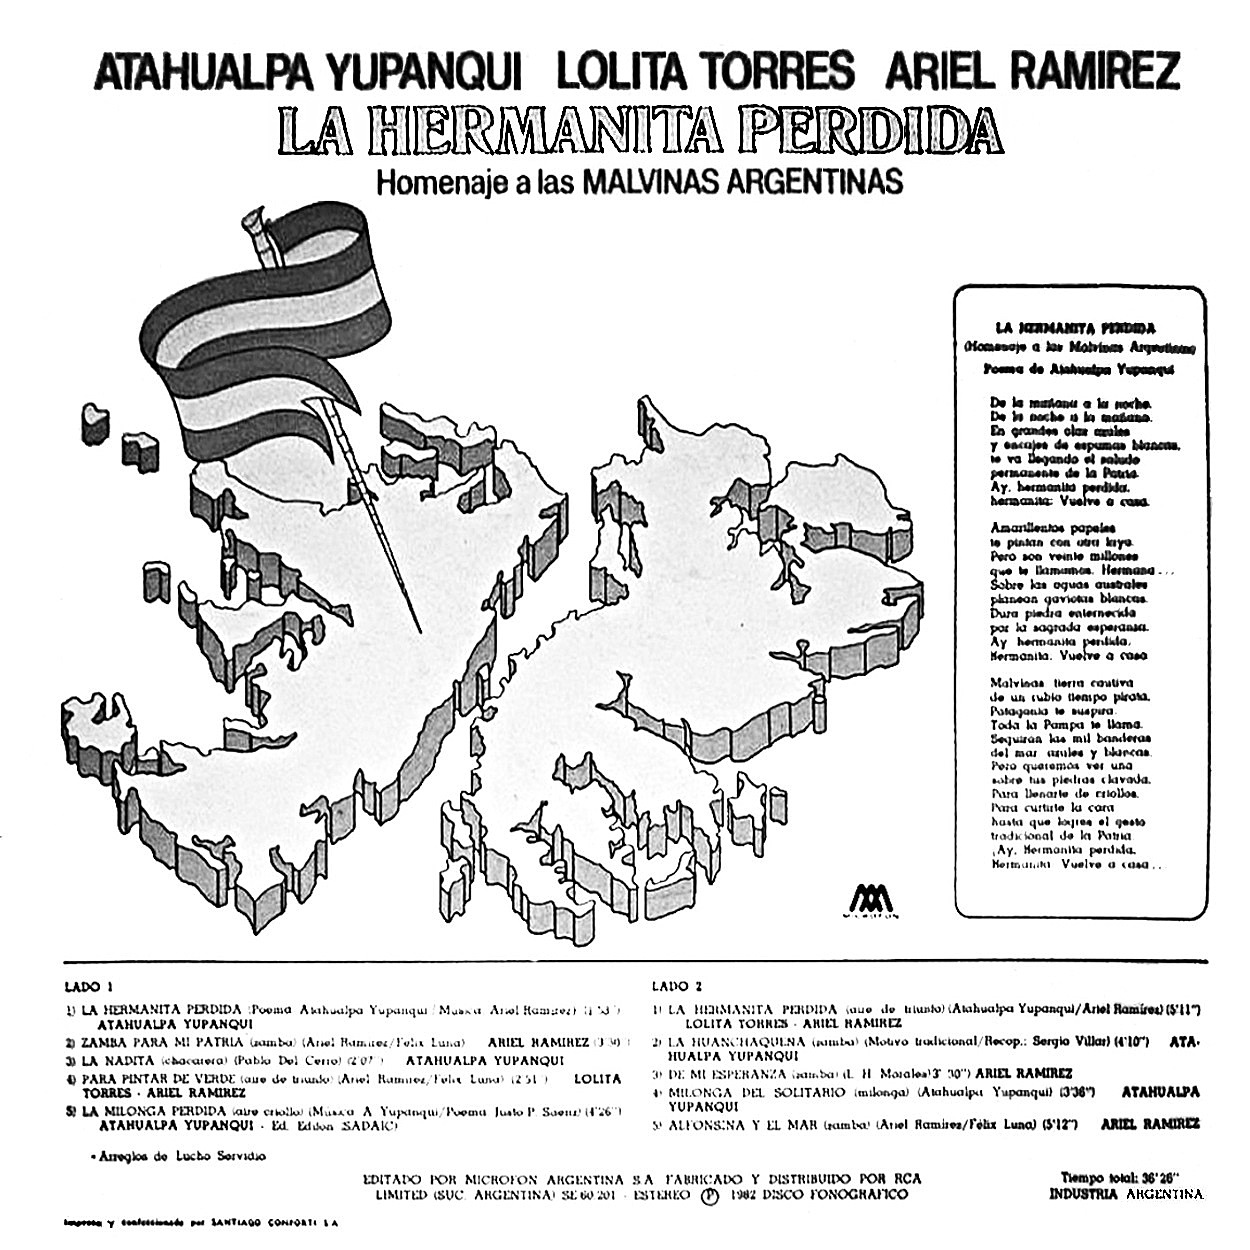 Folklore del NOA: ATAHUALPA YUPANQUI - LOLITA TORRES - ARIEL RAMÍREZ ...